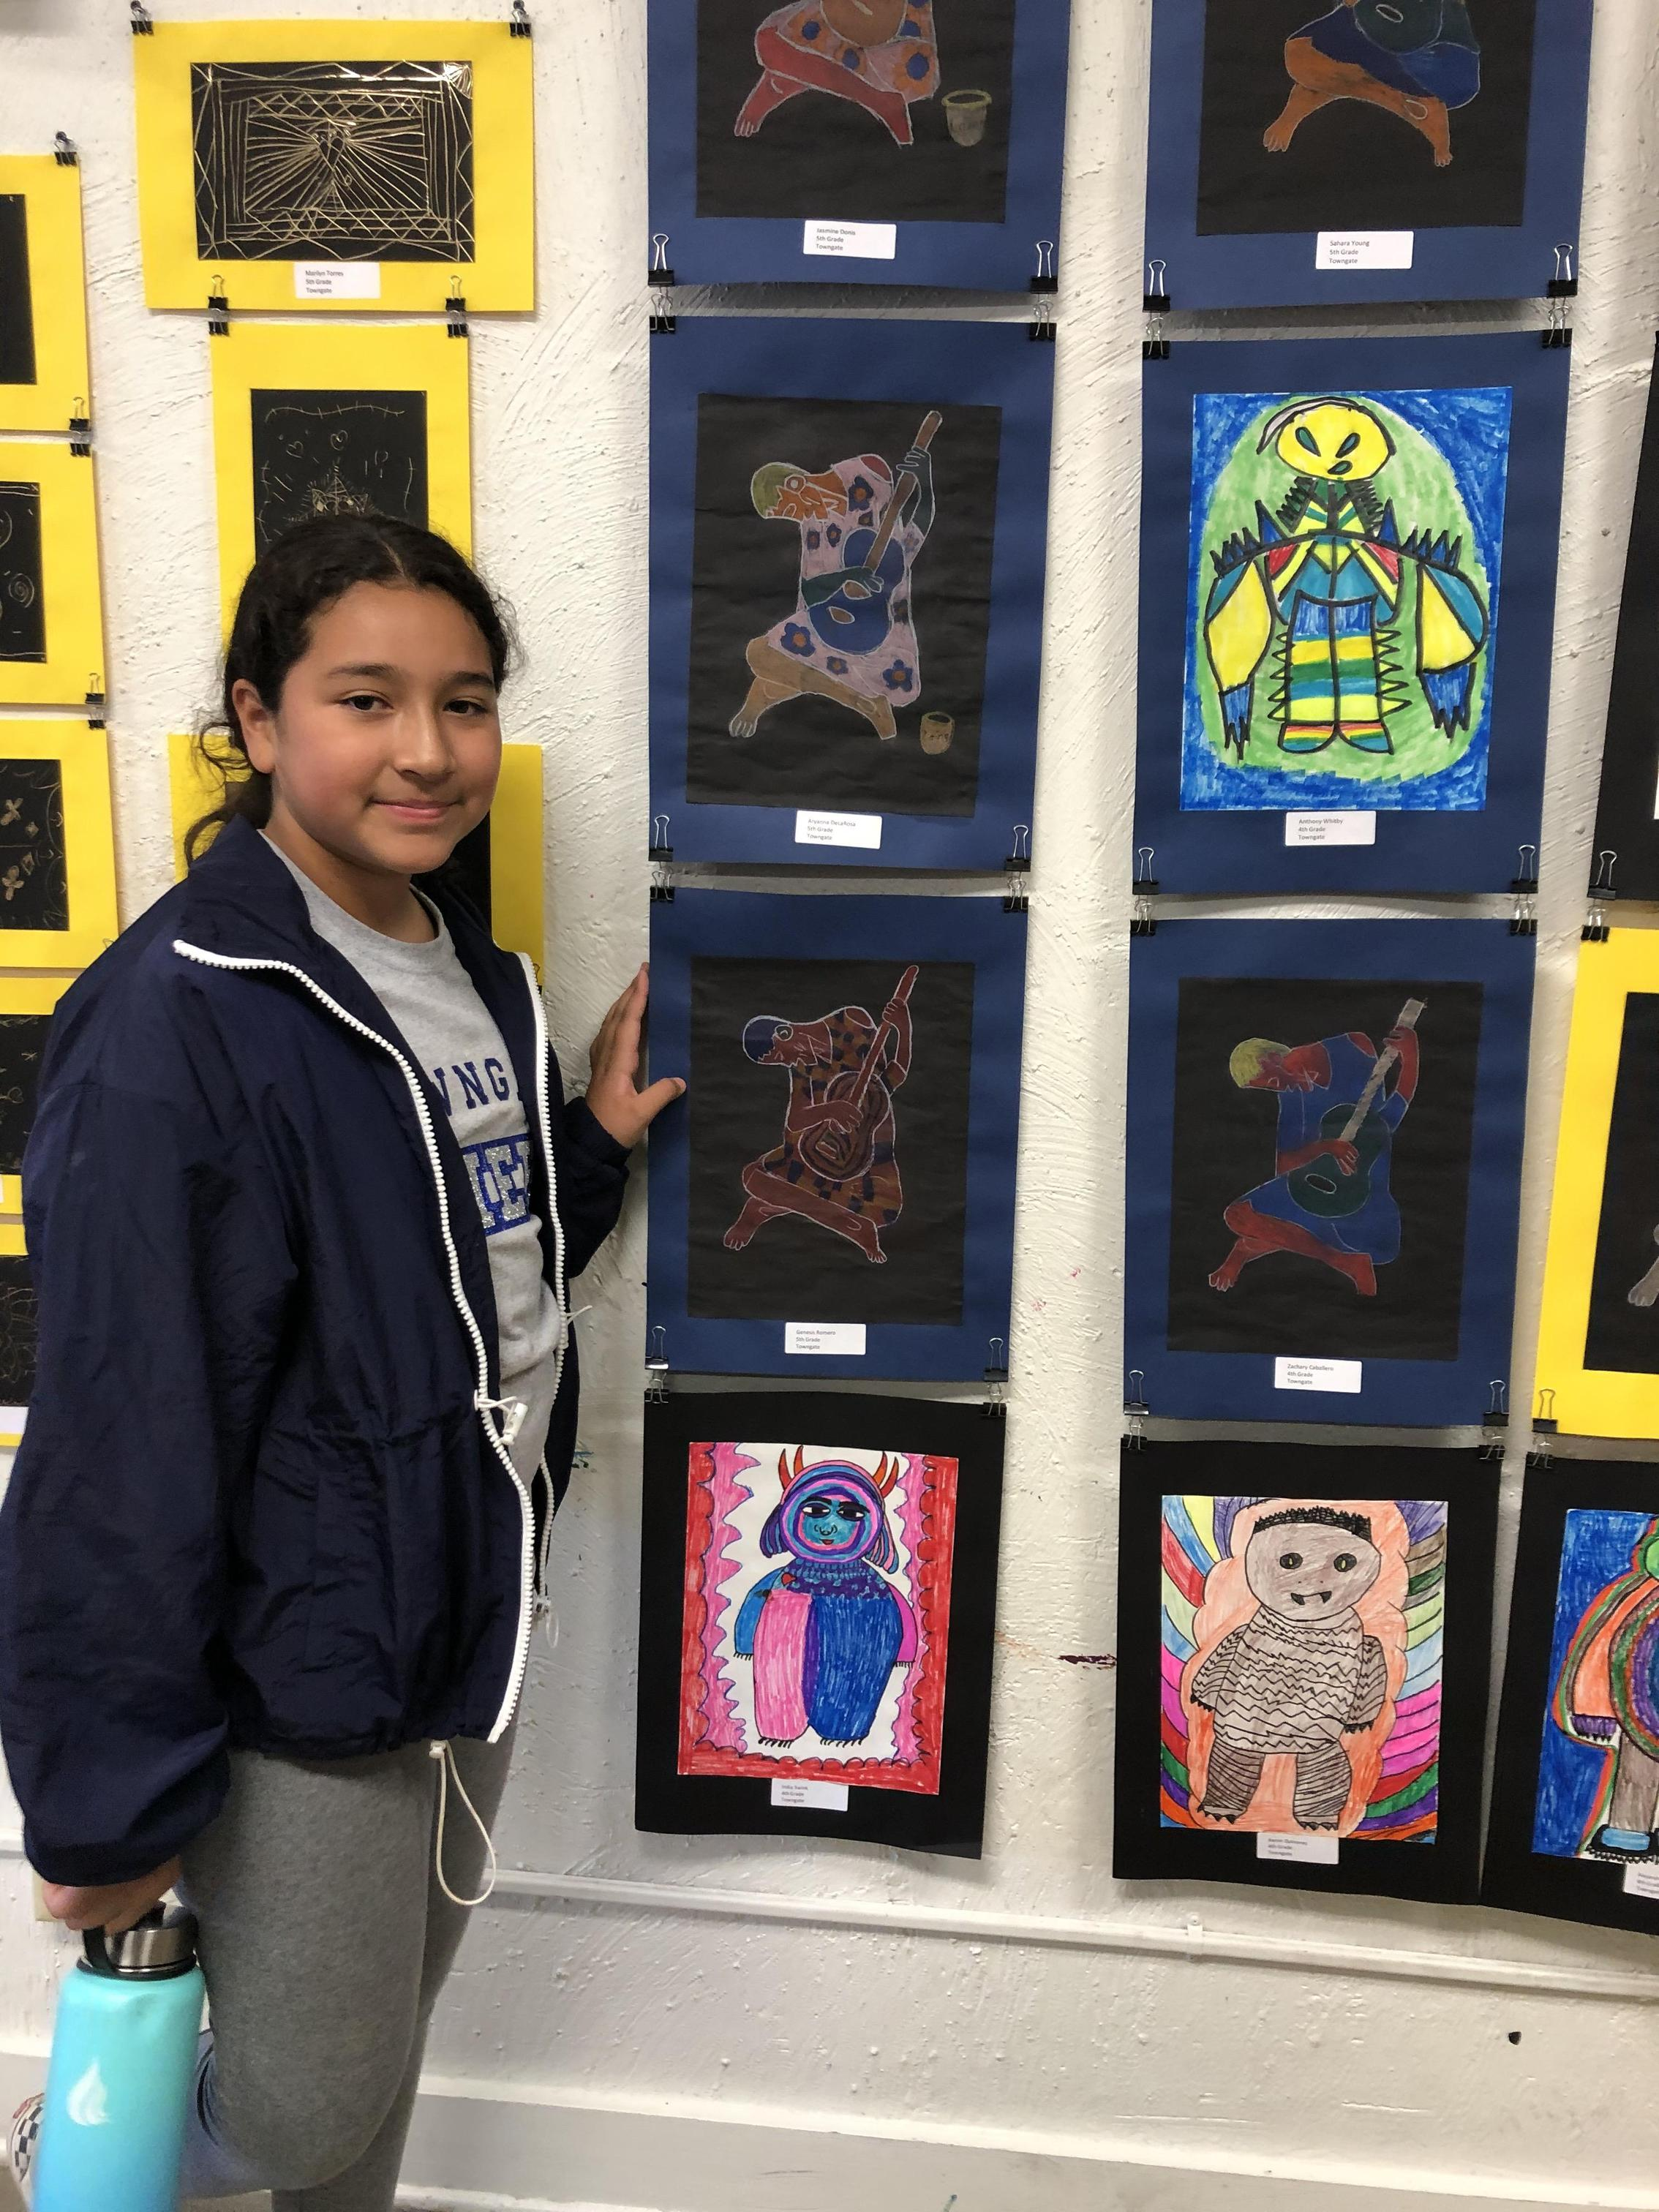 Student posing next to their art